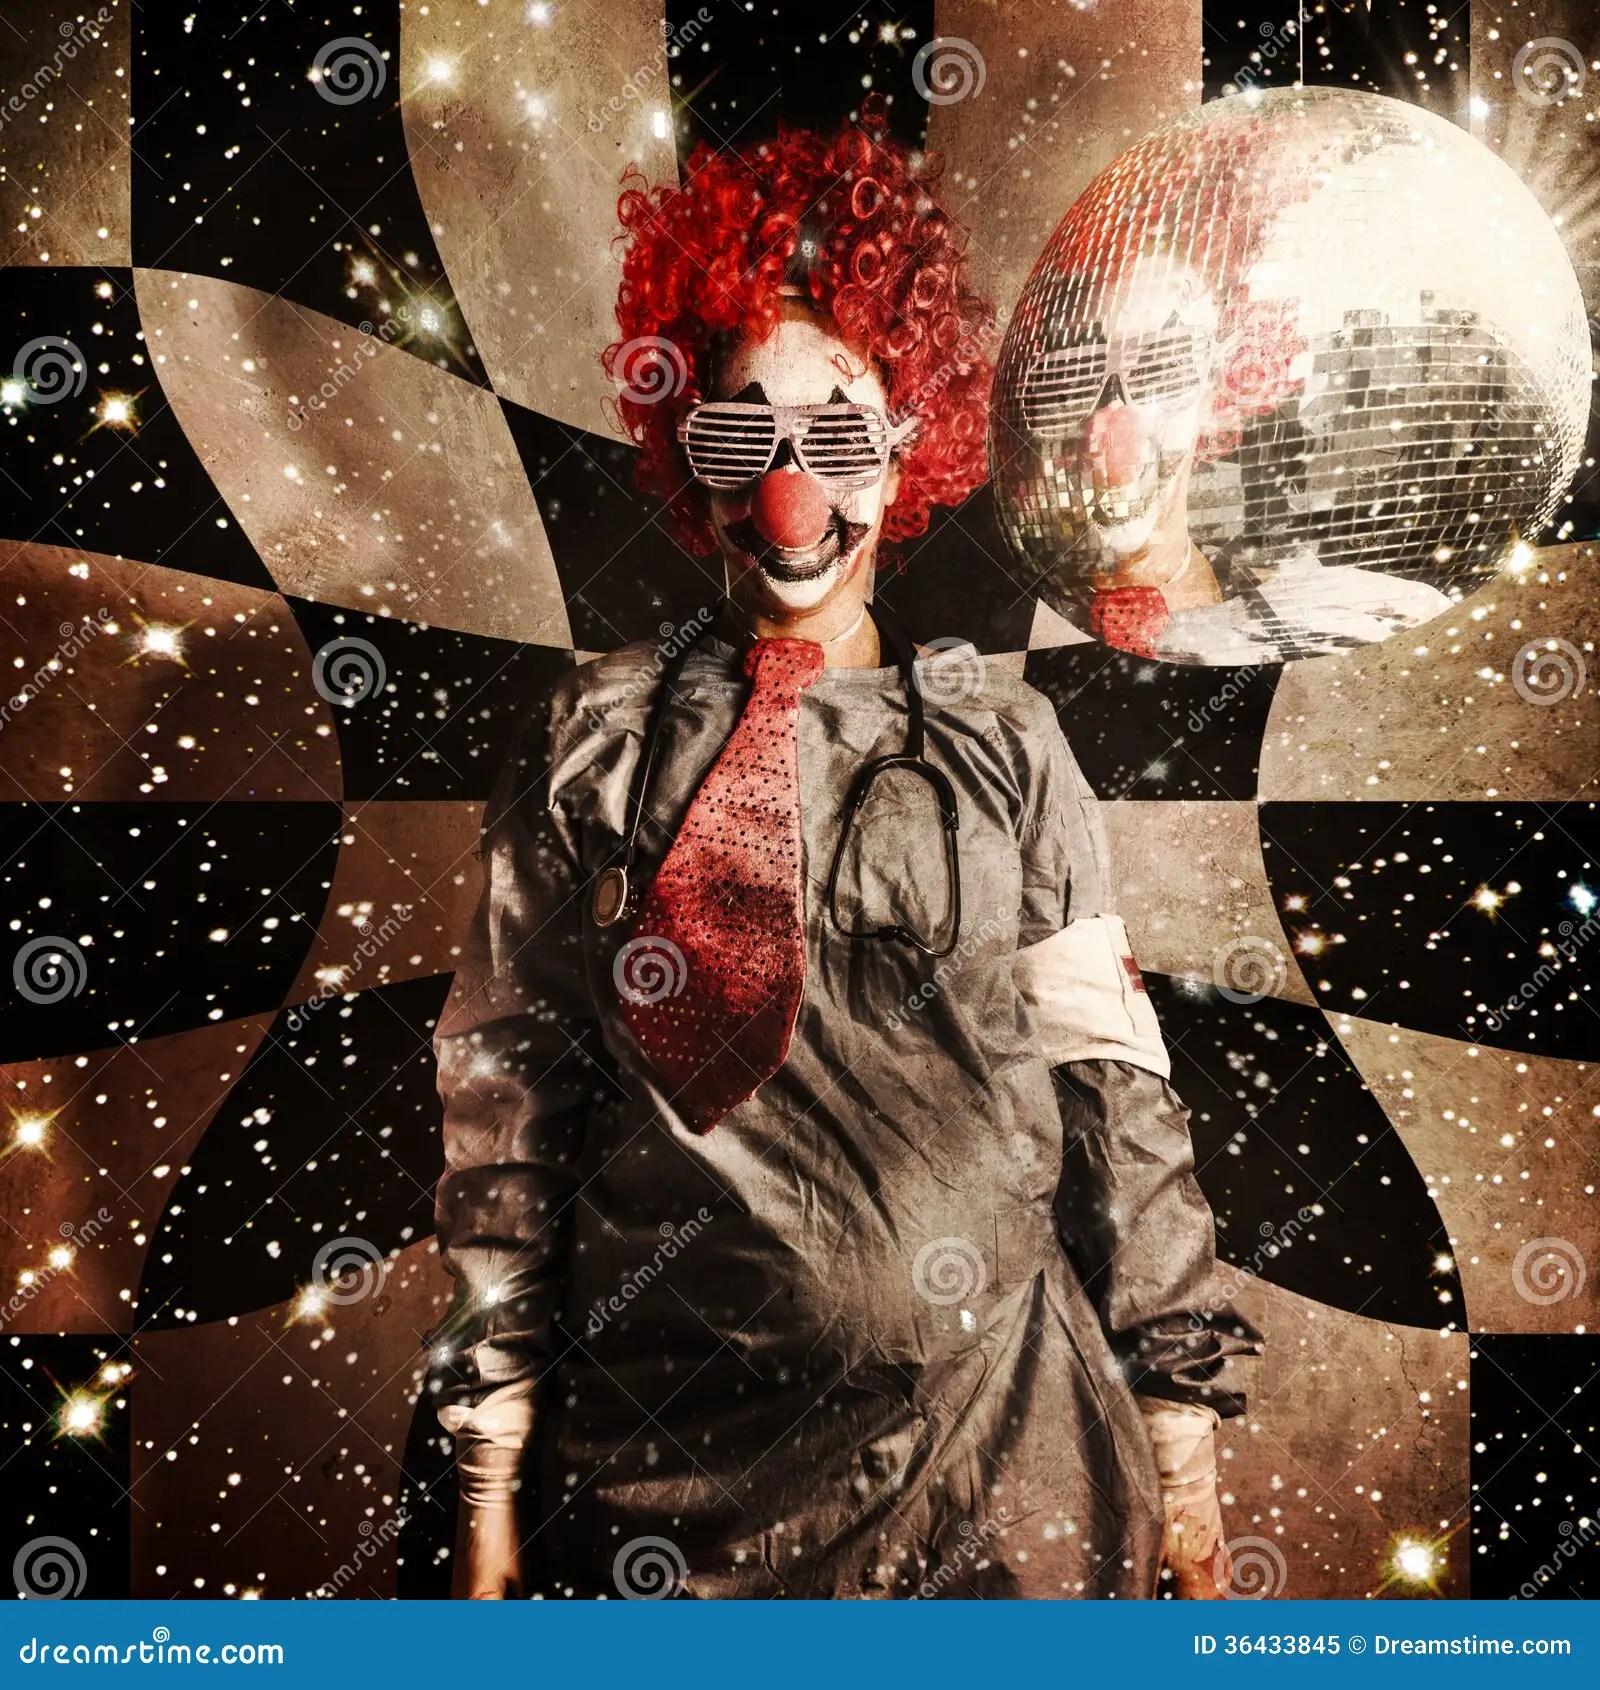 Crazy Dancing Doctor Who